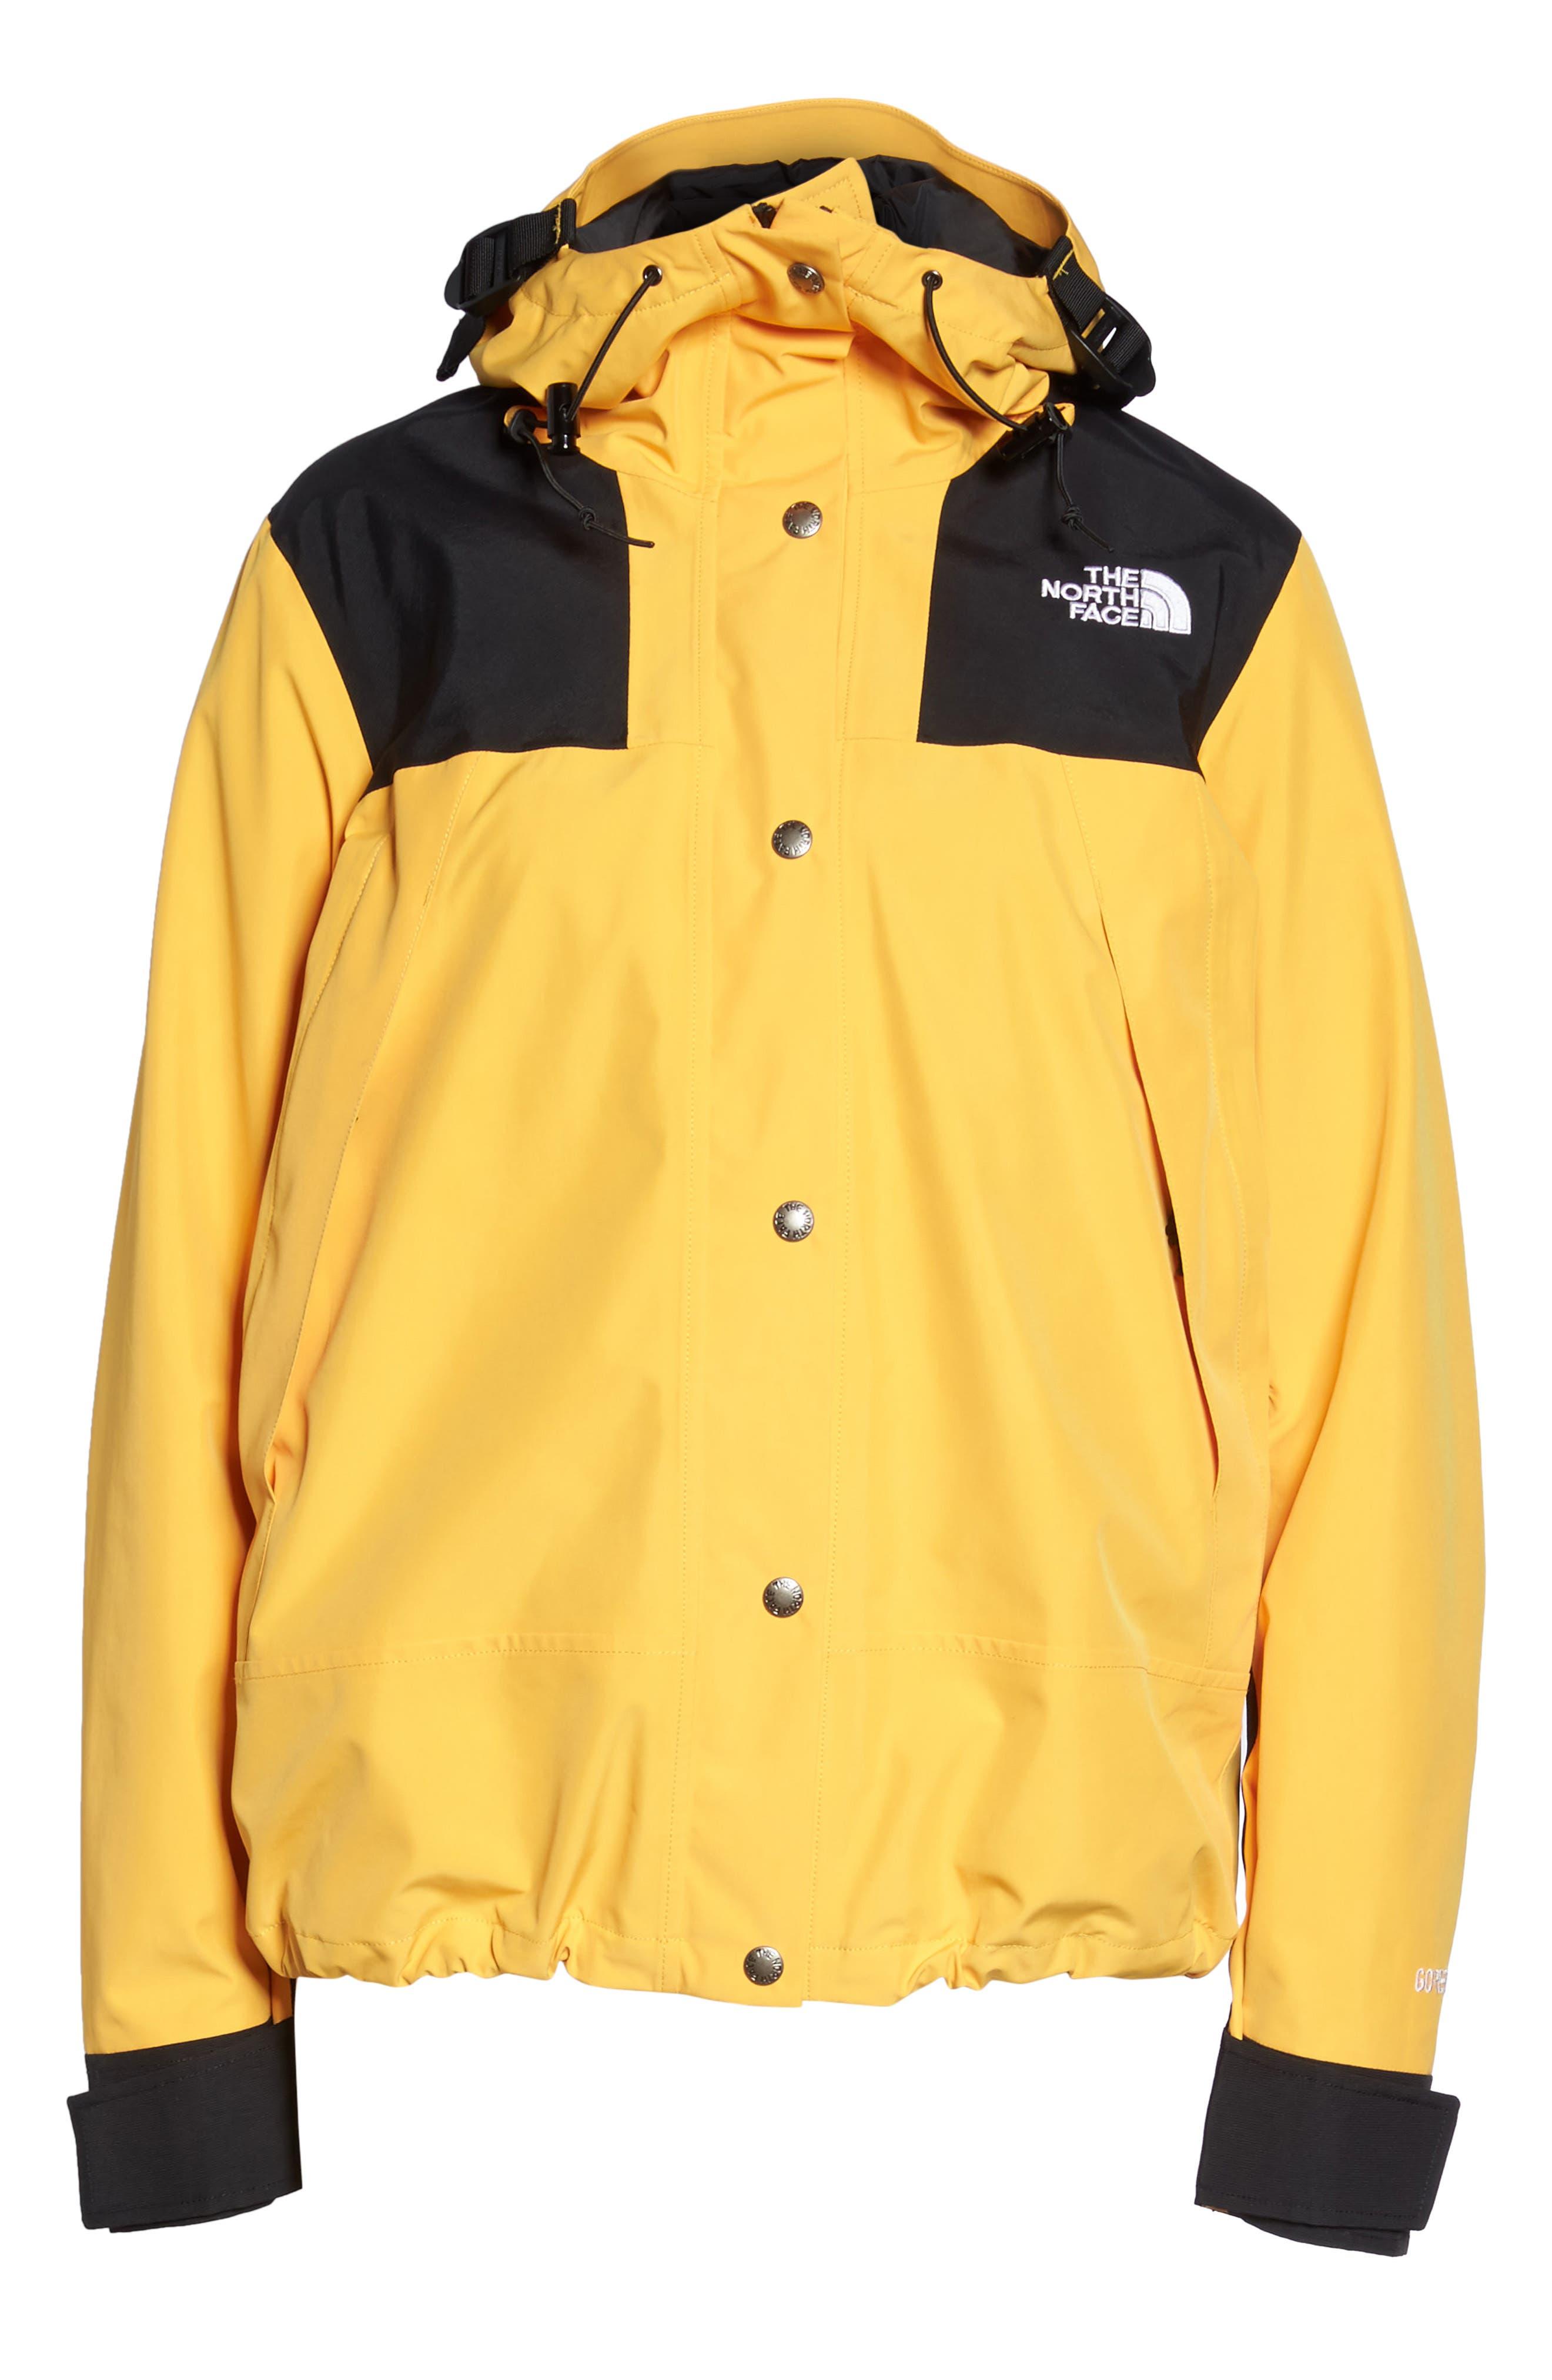 1990 Mountain Jacket,                             Alternate thumbnail 7, color,                             Tnf Yellow